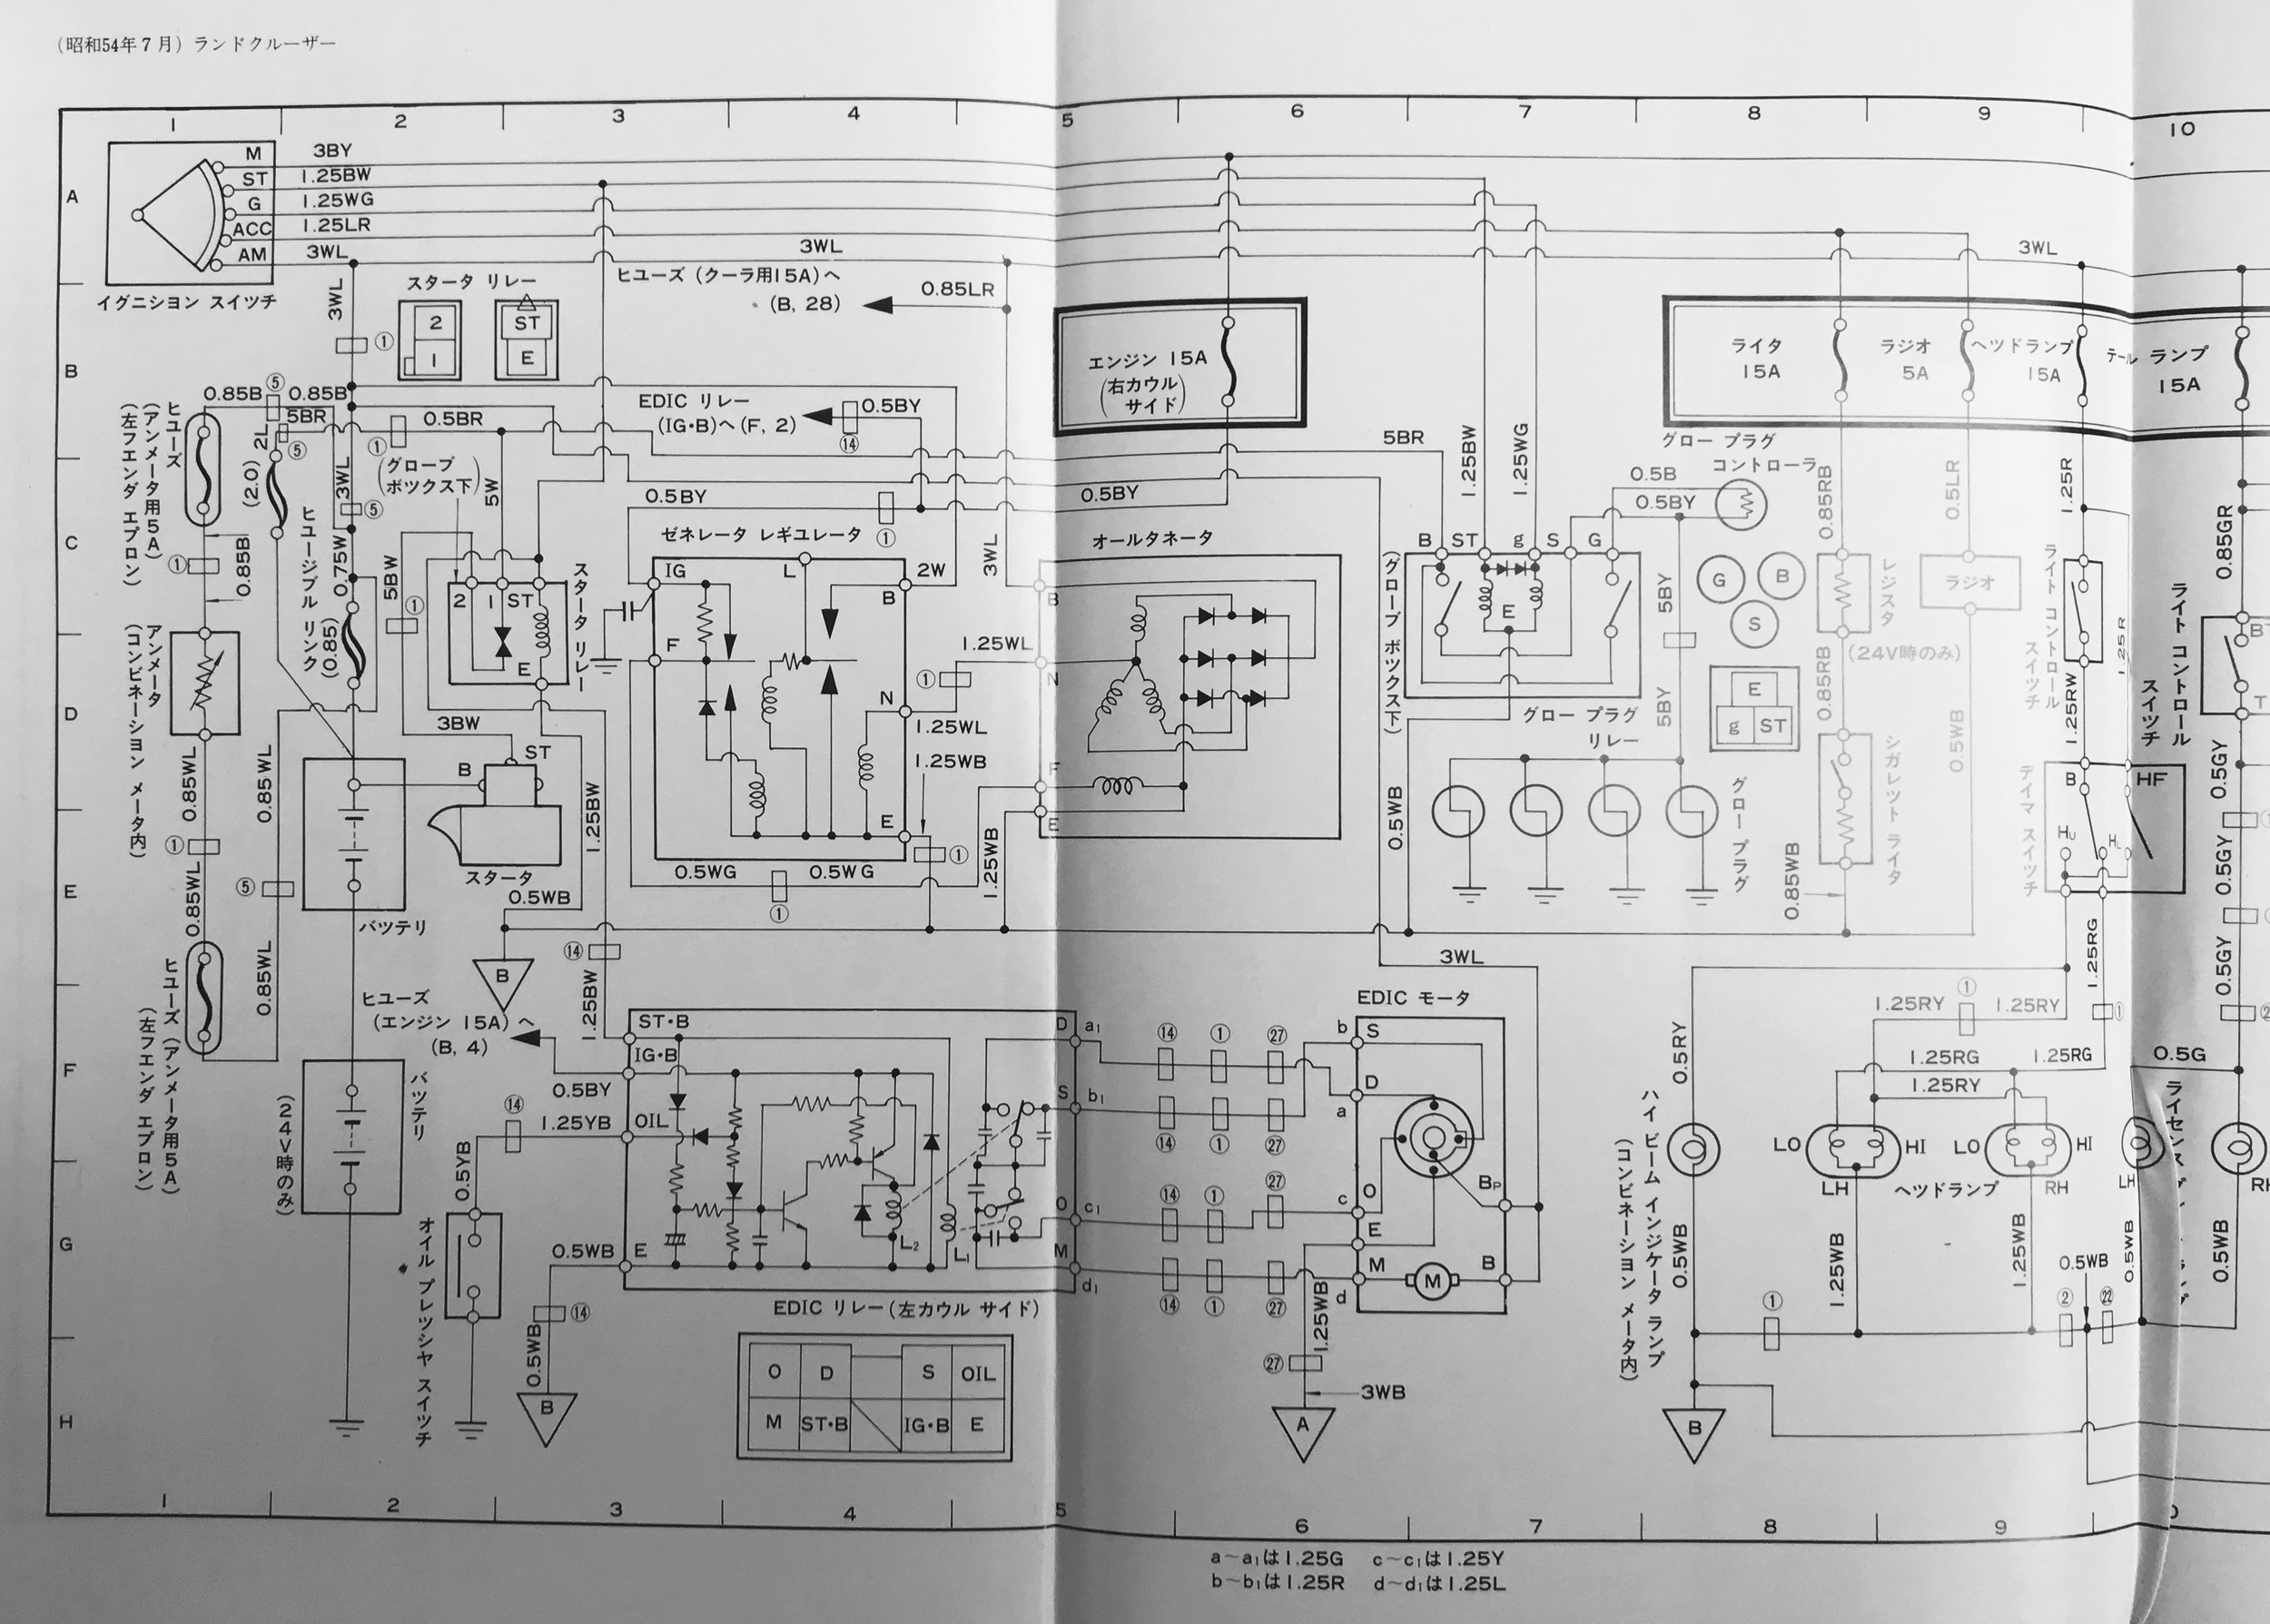 Tlc40 80 Bj74 Wiring Diagram 8ef68c36 1944 4b44 A52a 49e386b58fa2thumbjpega67fd4d06961d4dae31bd08f4e7138ed